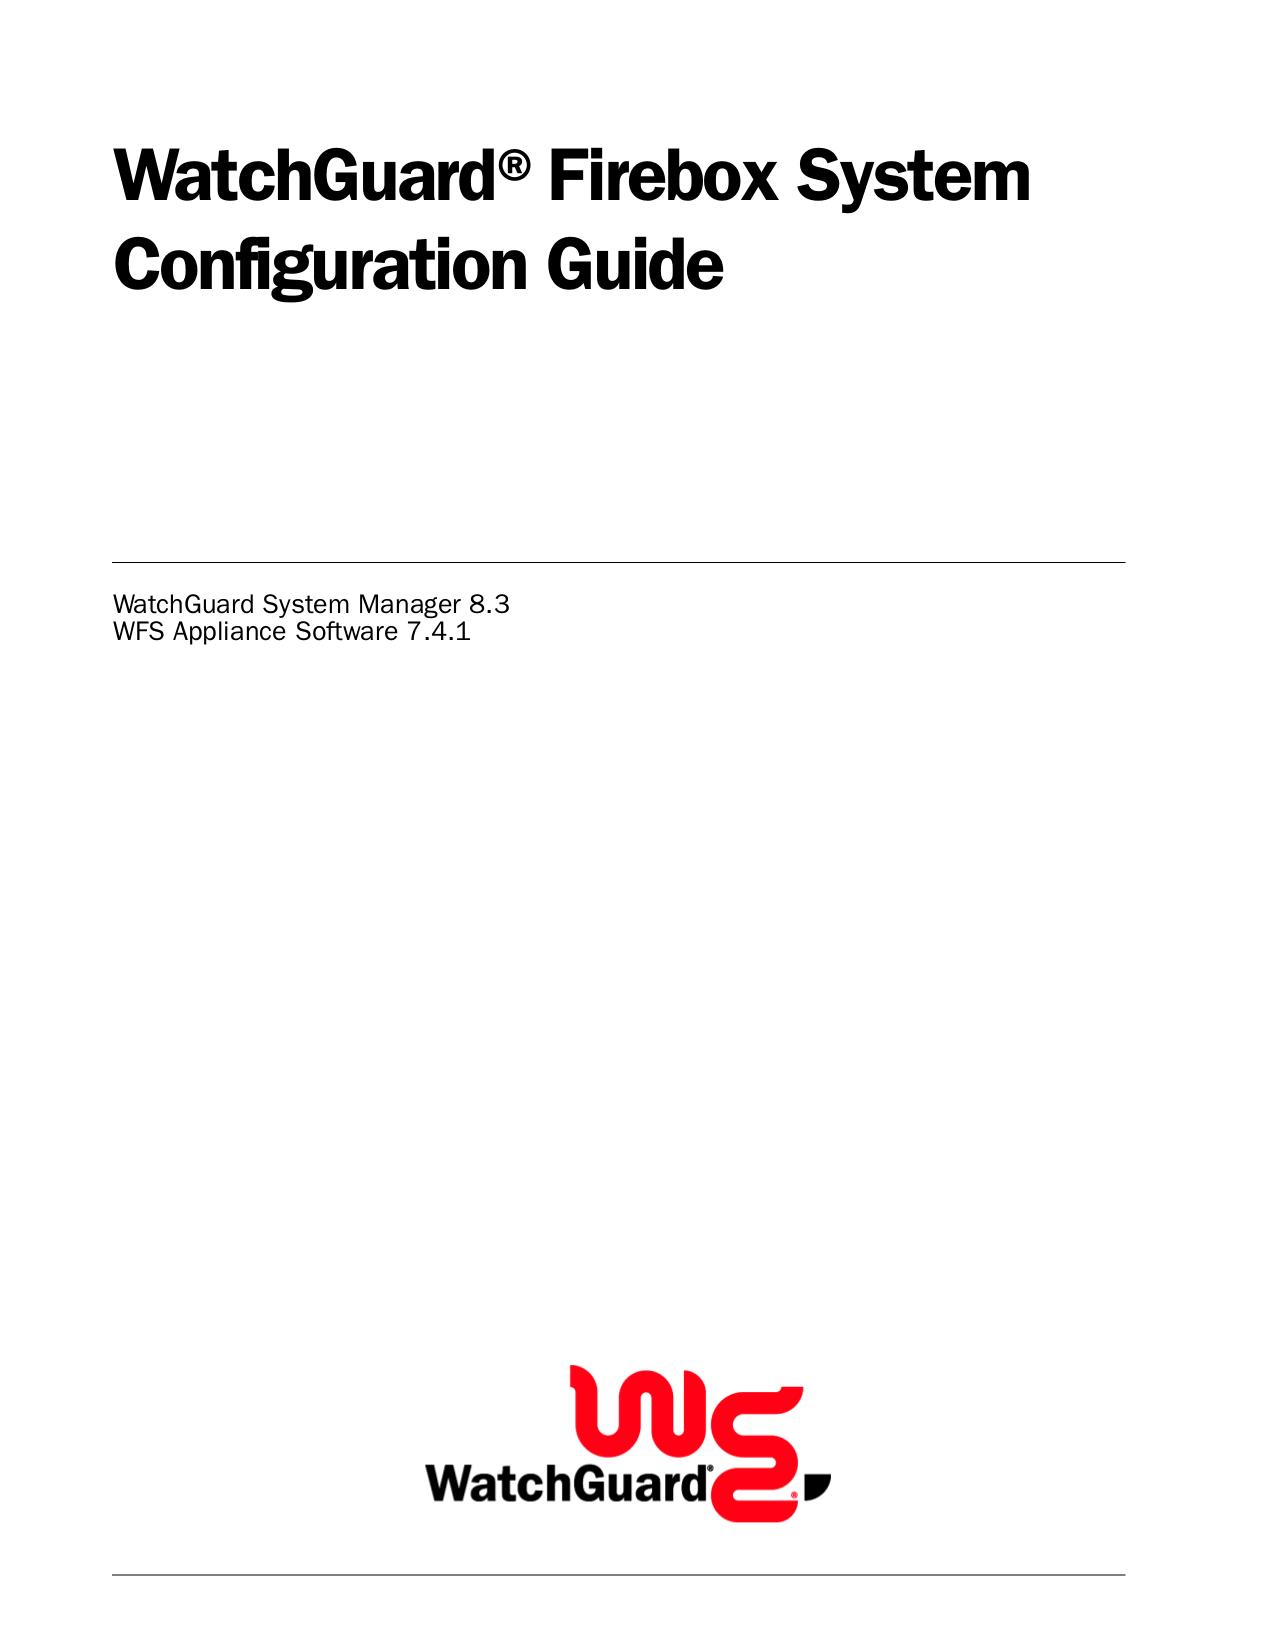 pdf for Watchguard Wireless Router Firebox X5-W manual